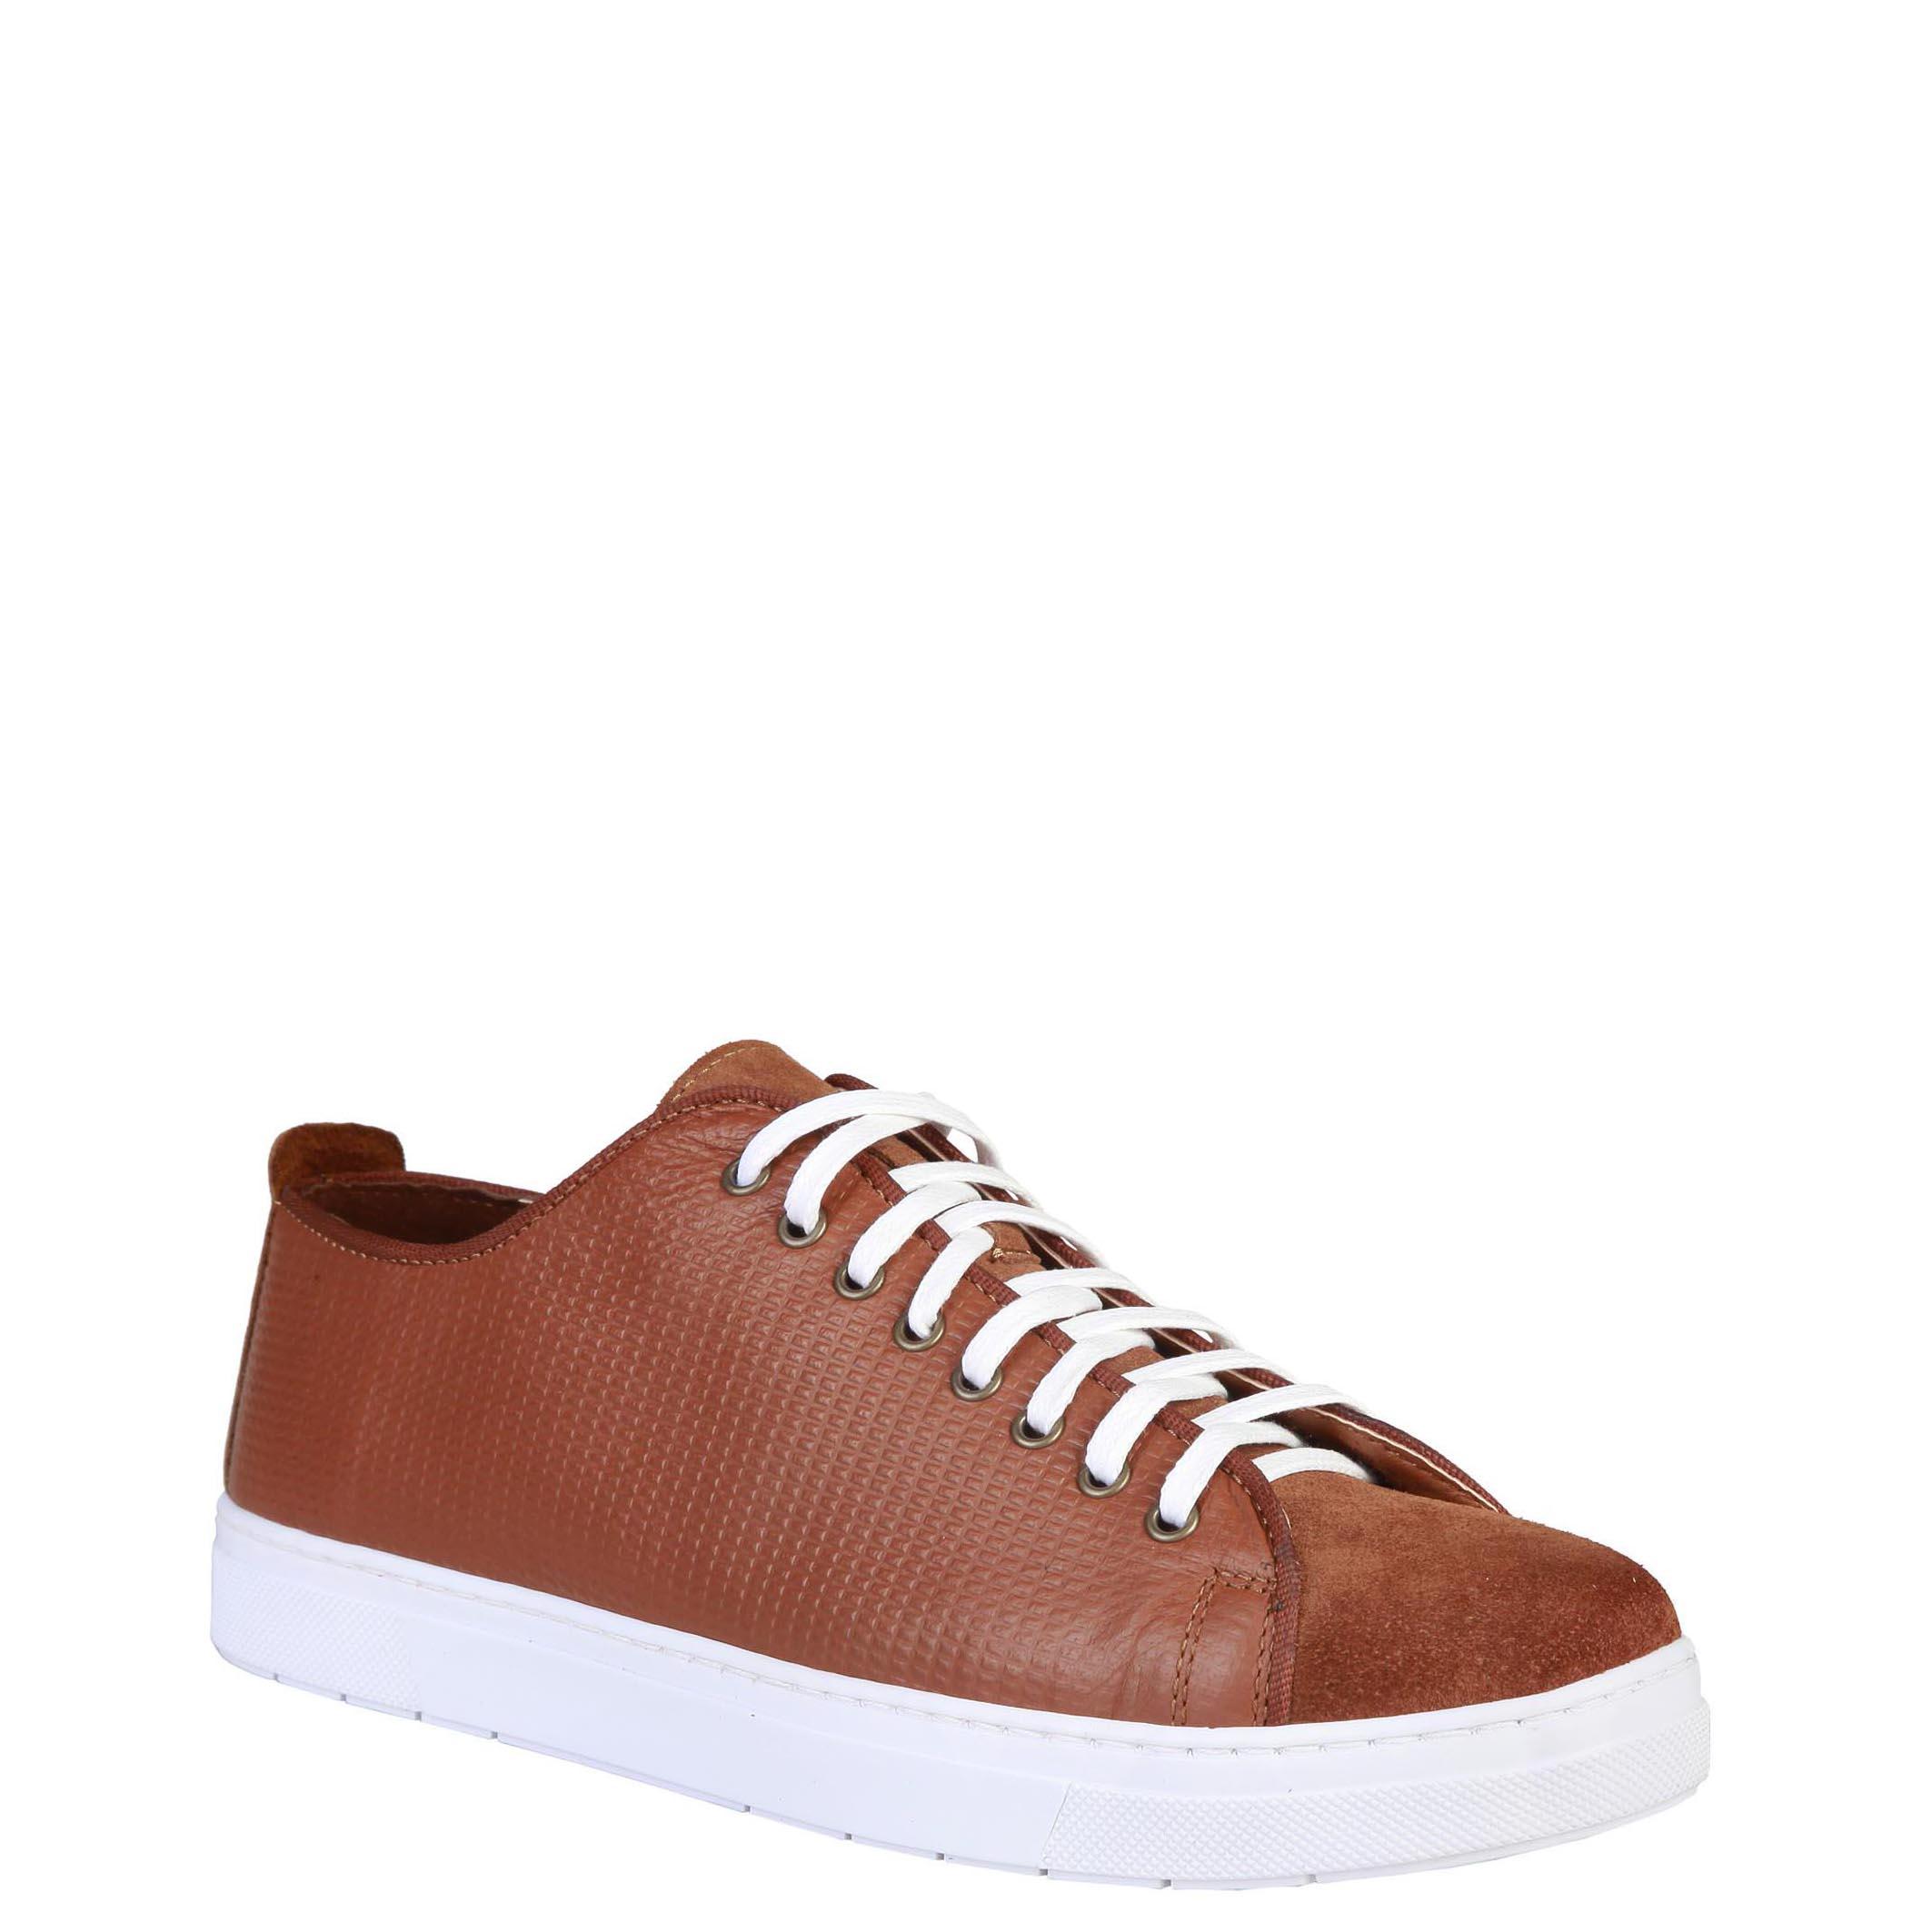 Sneakers-Pierre-Cardin-EDGARD-Uomo-Marrone-81933 miniatura 2